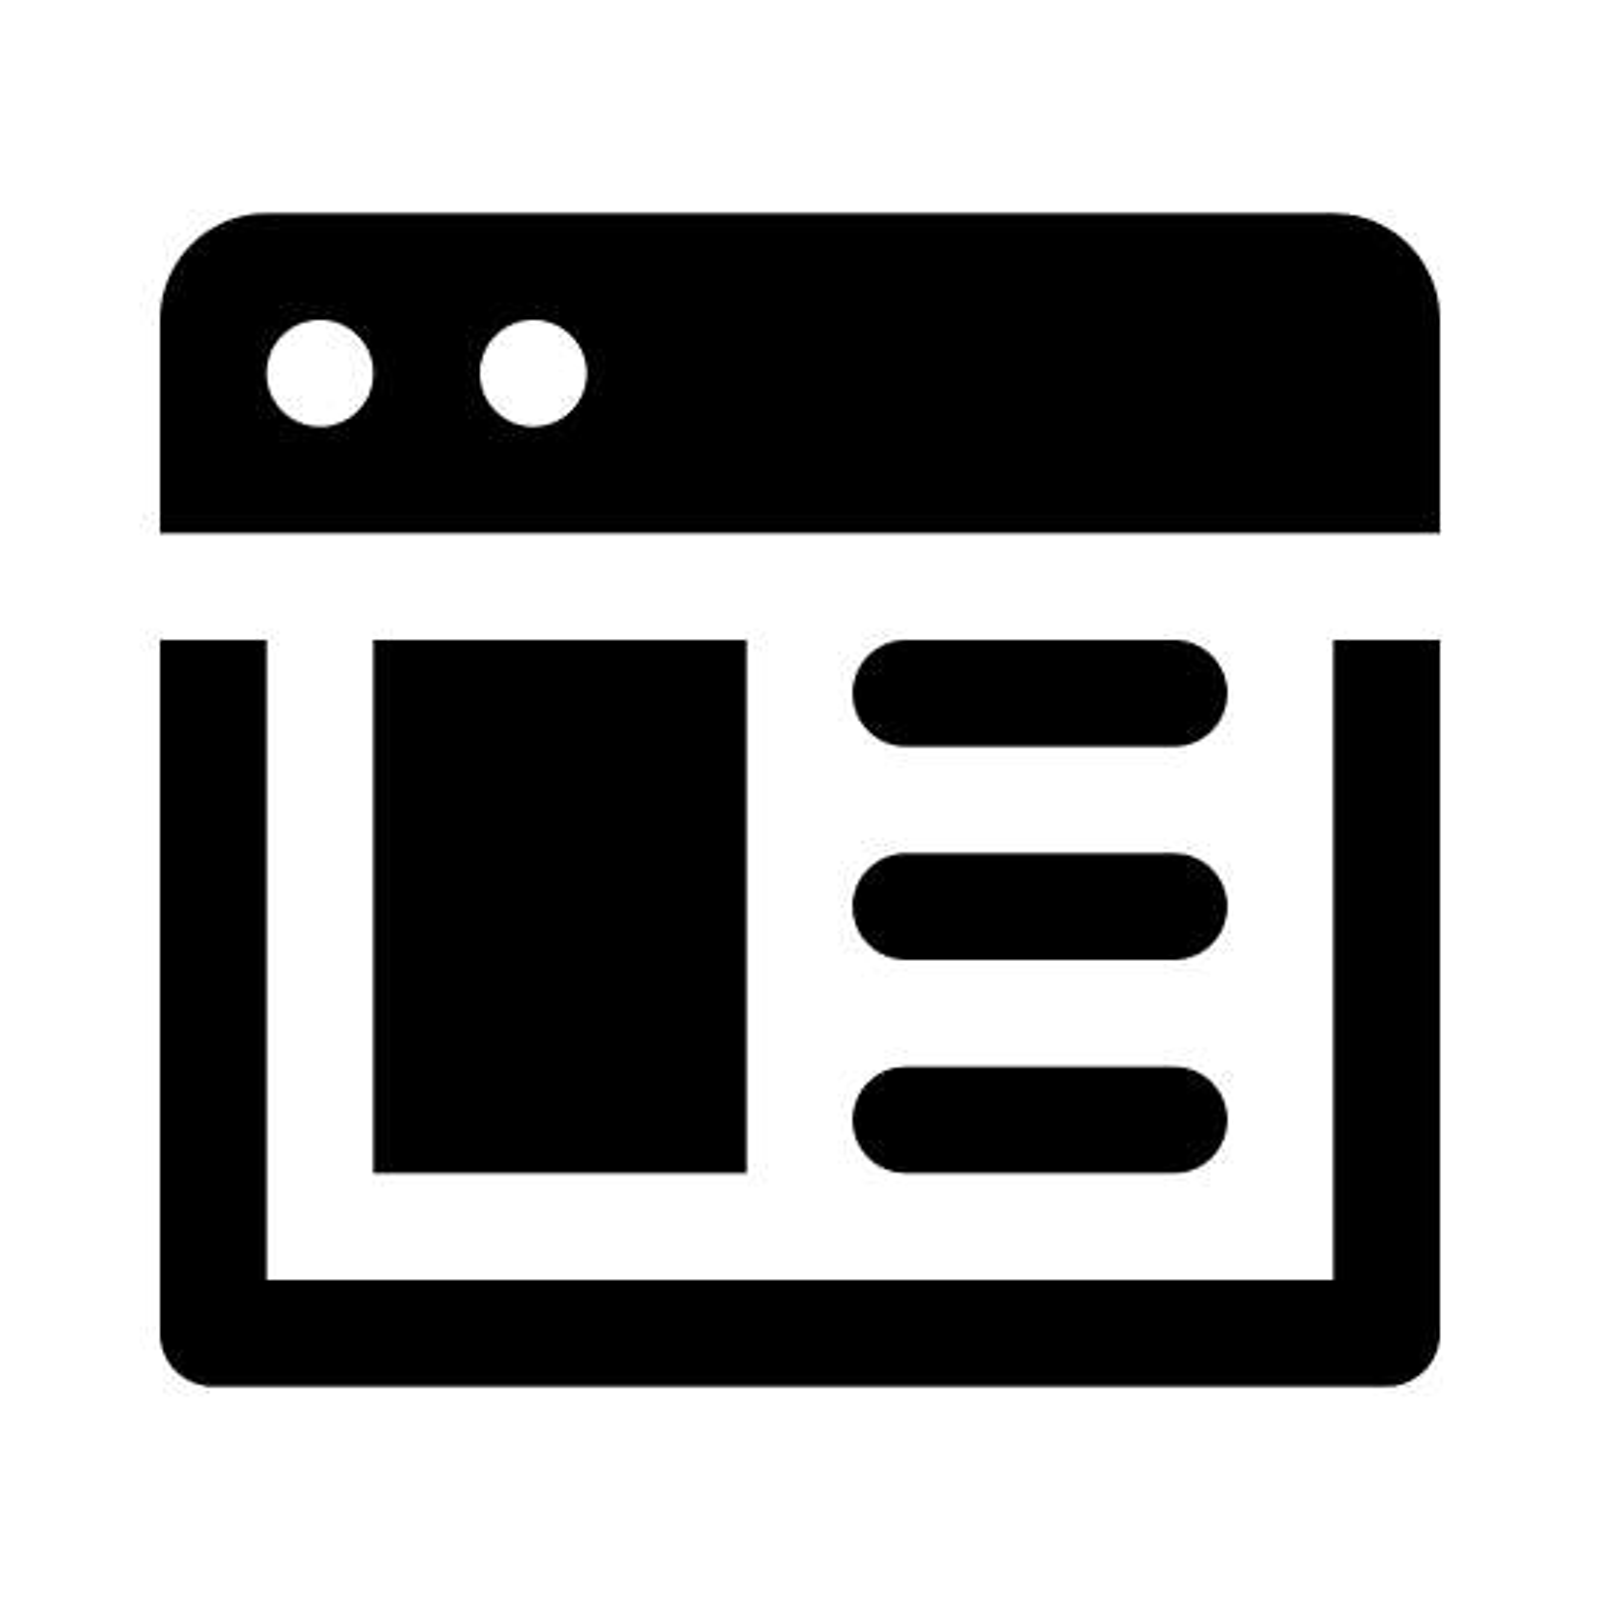 Веб-дизайн icon